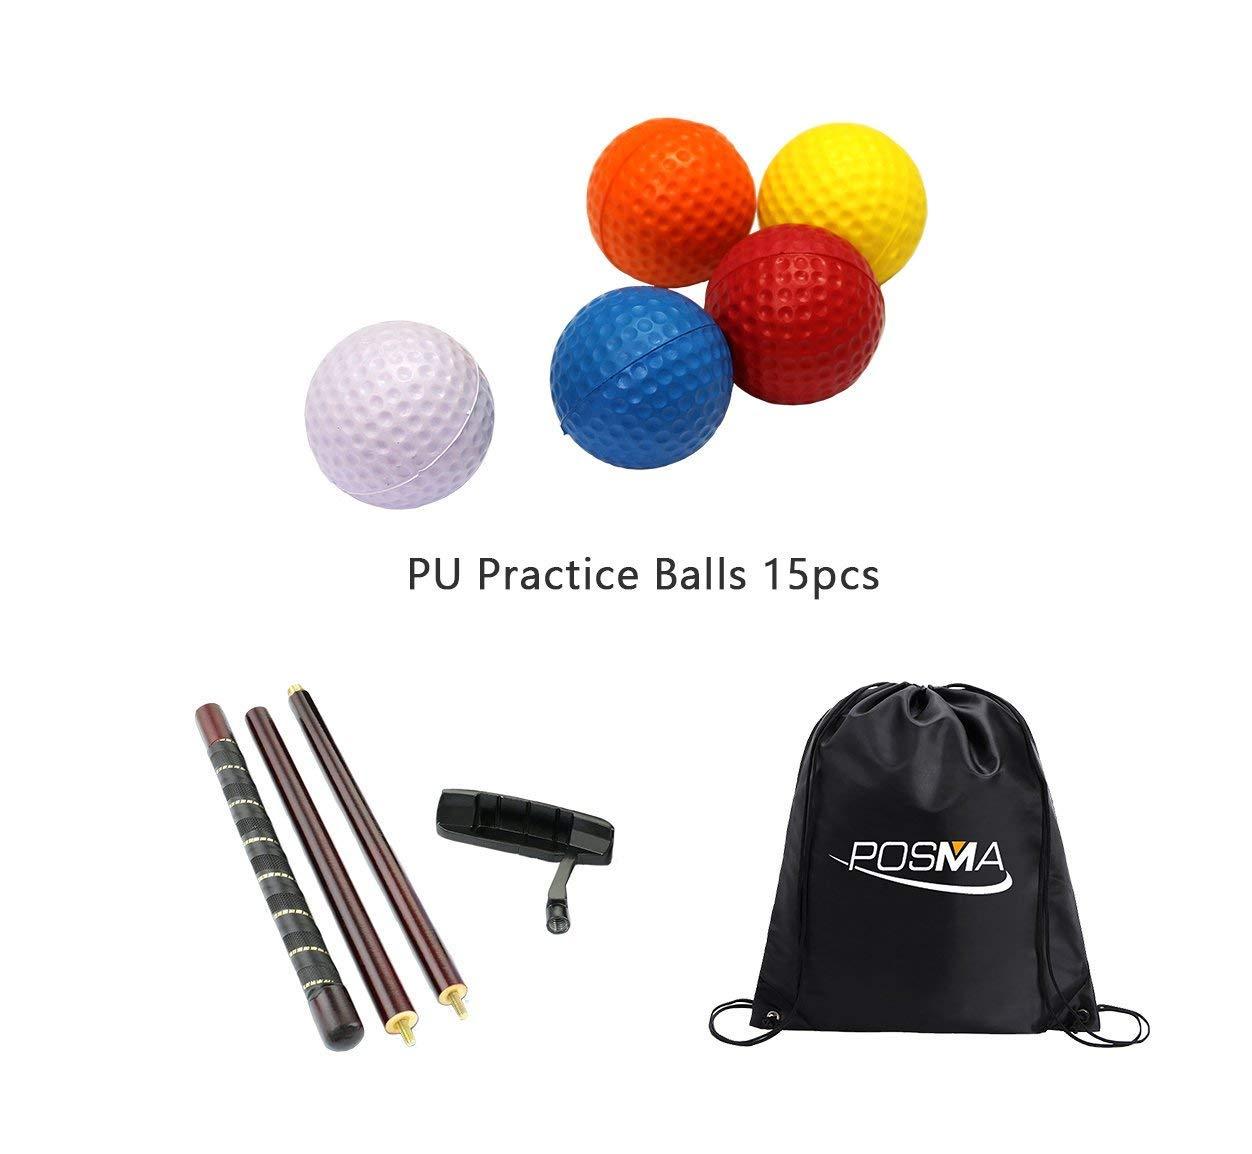 SYMTOP POSMA PB010Fゴルフパタートレーニングパッティングトレーナーバンドルギフトセット付き4セクションパター、15ピースPU練習ボール   B07G52F2DS